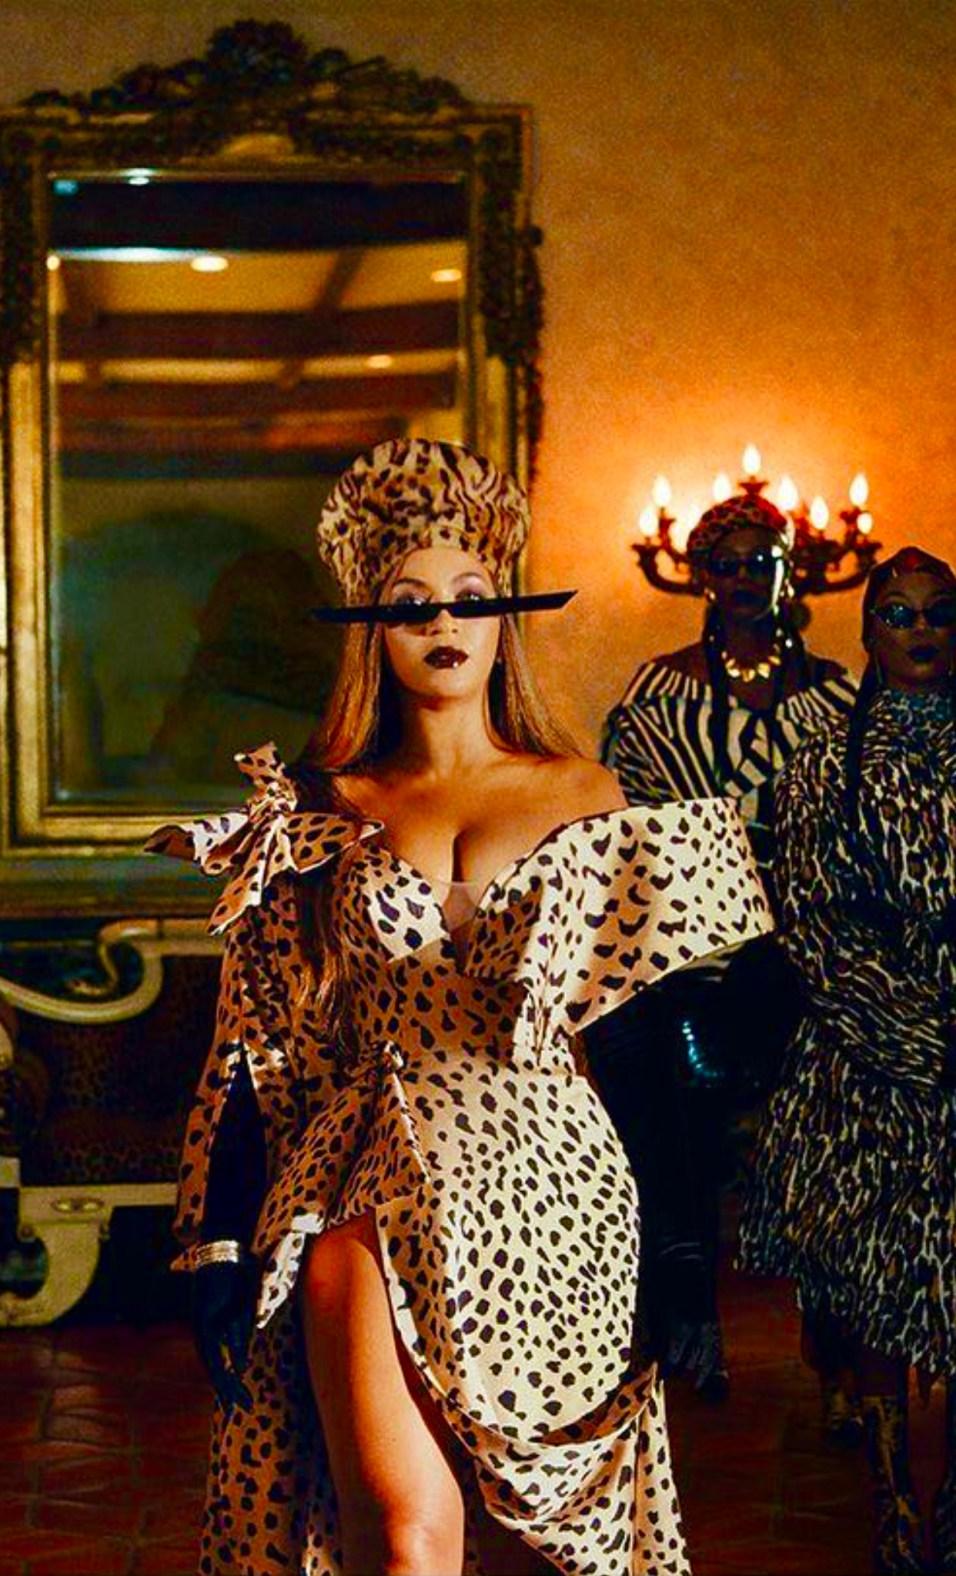 #BLACKISKING is but make it plus -leopard dress